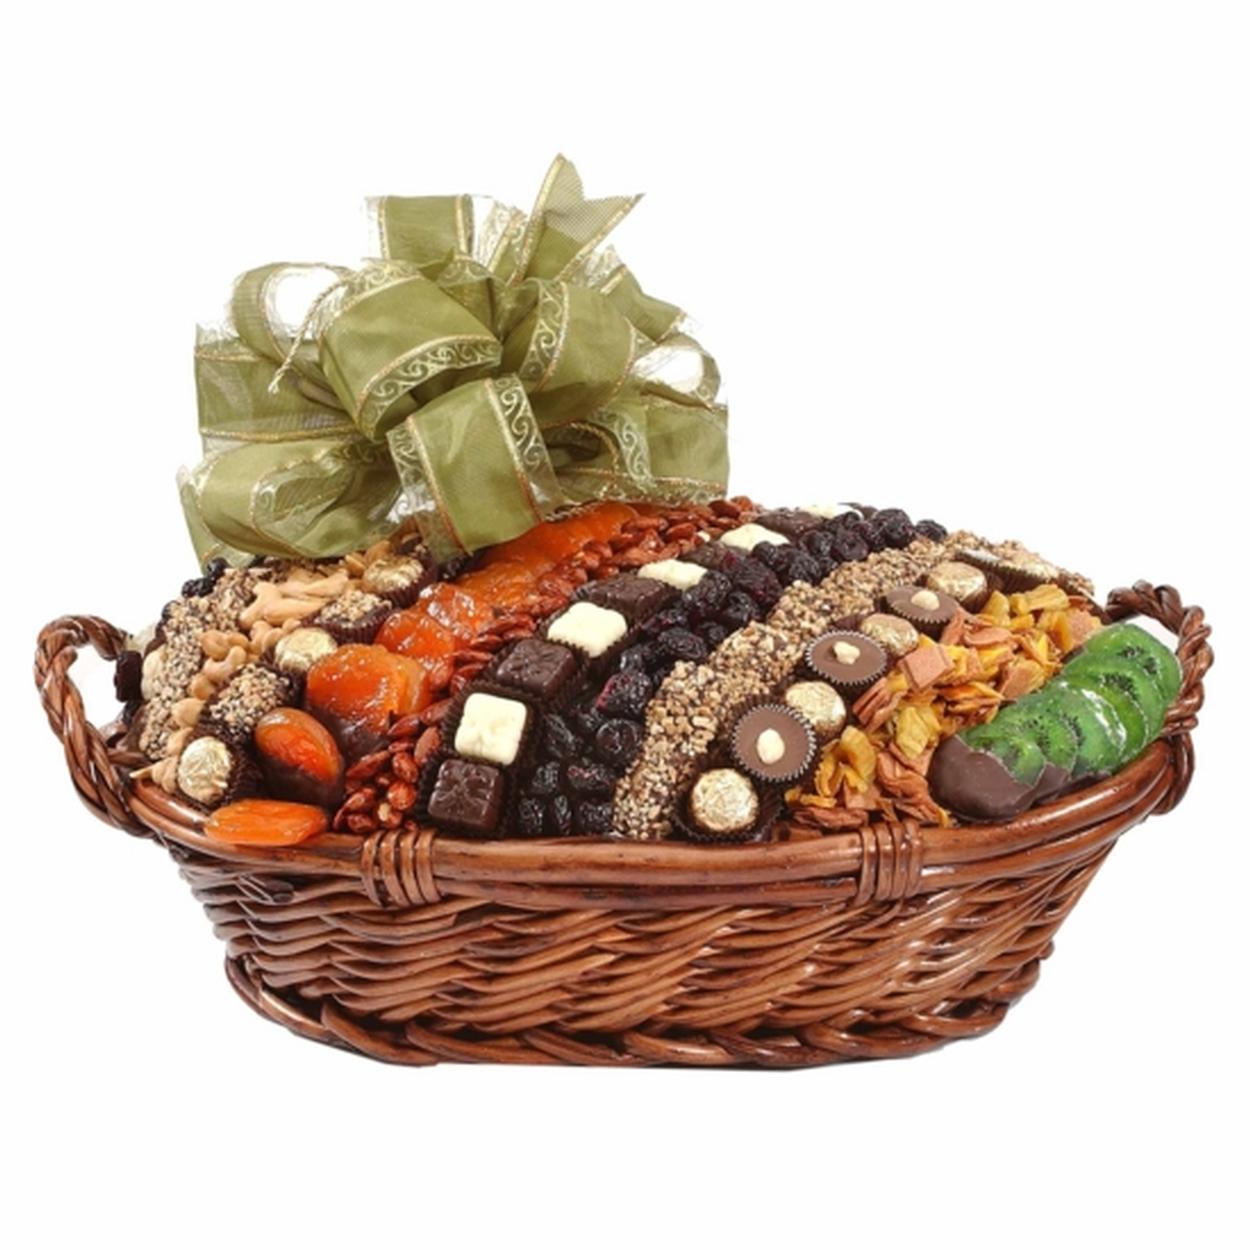 Jumbo Israeli Chocolate, Dried Fruit & Nut Basket - Israel Only